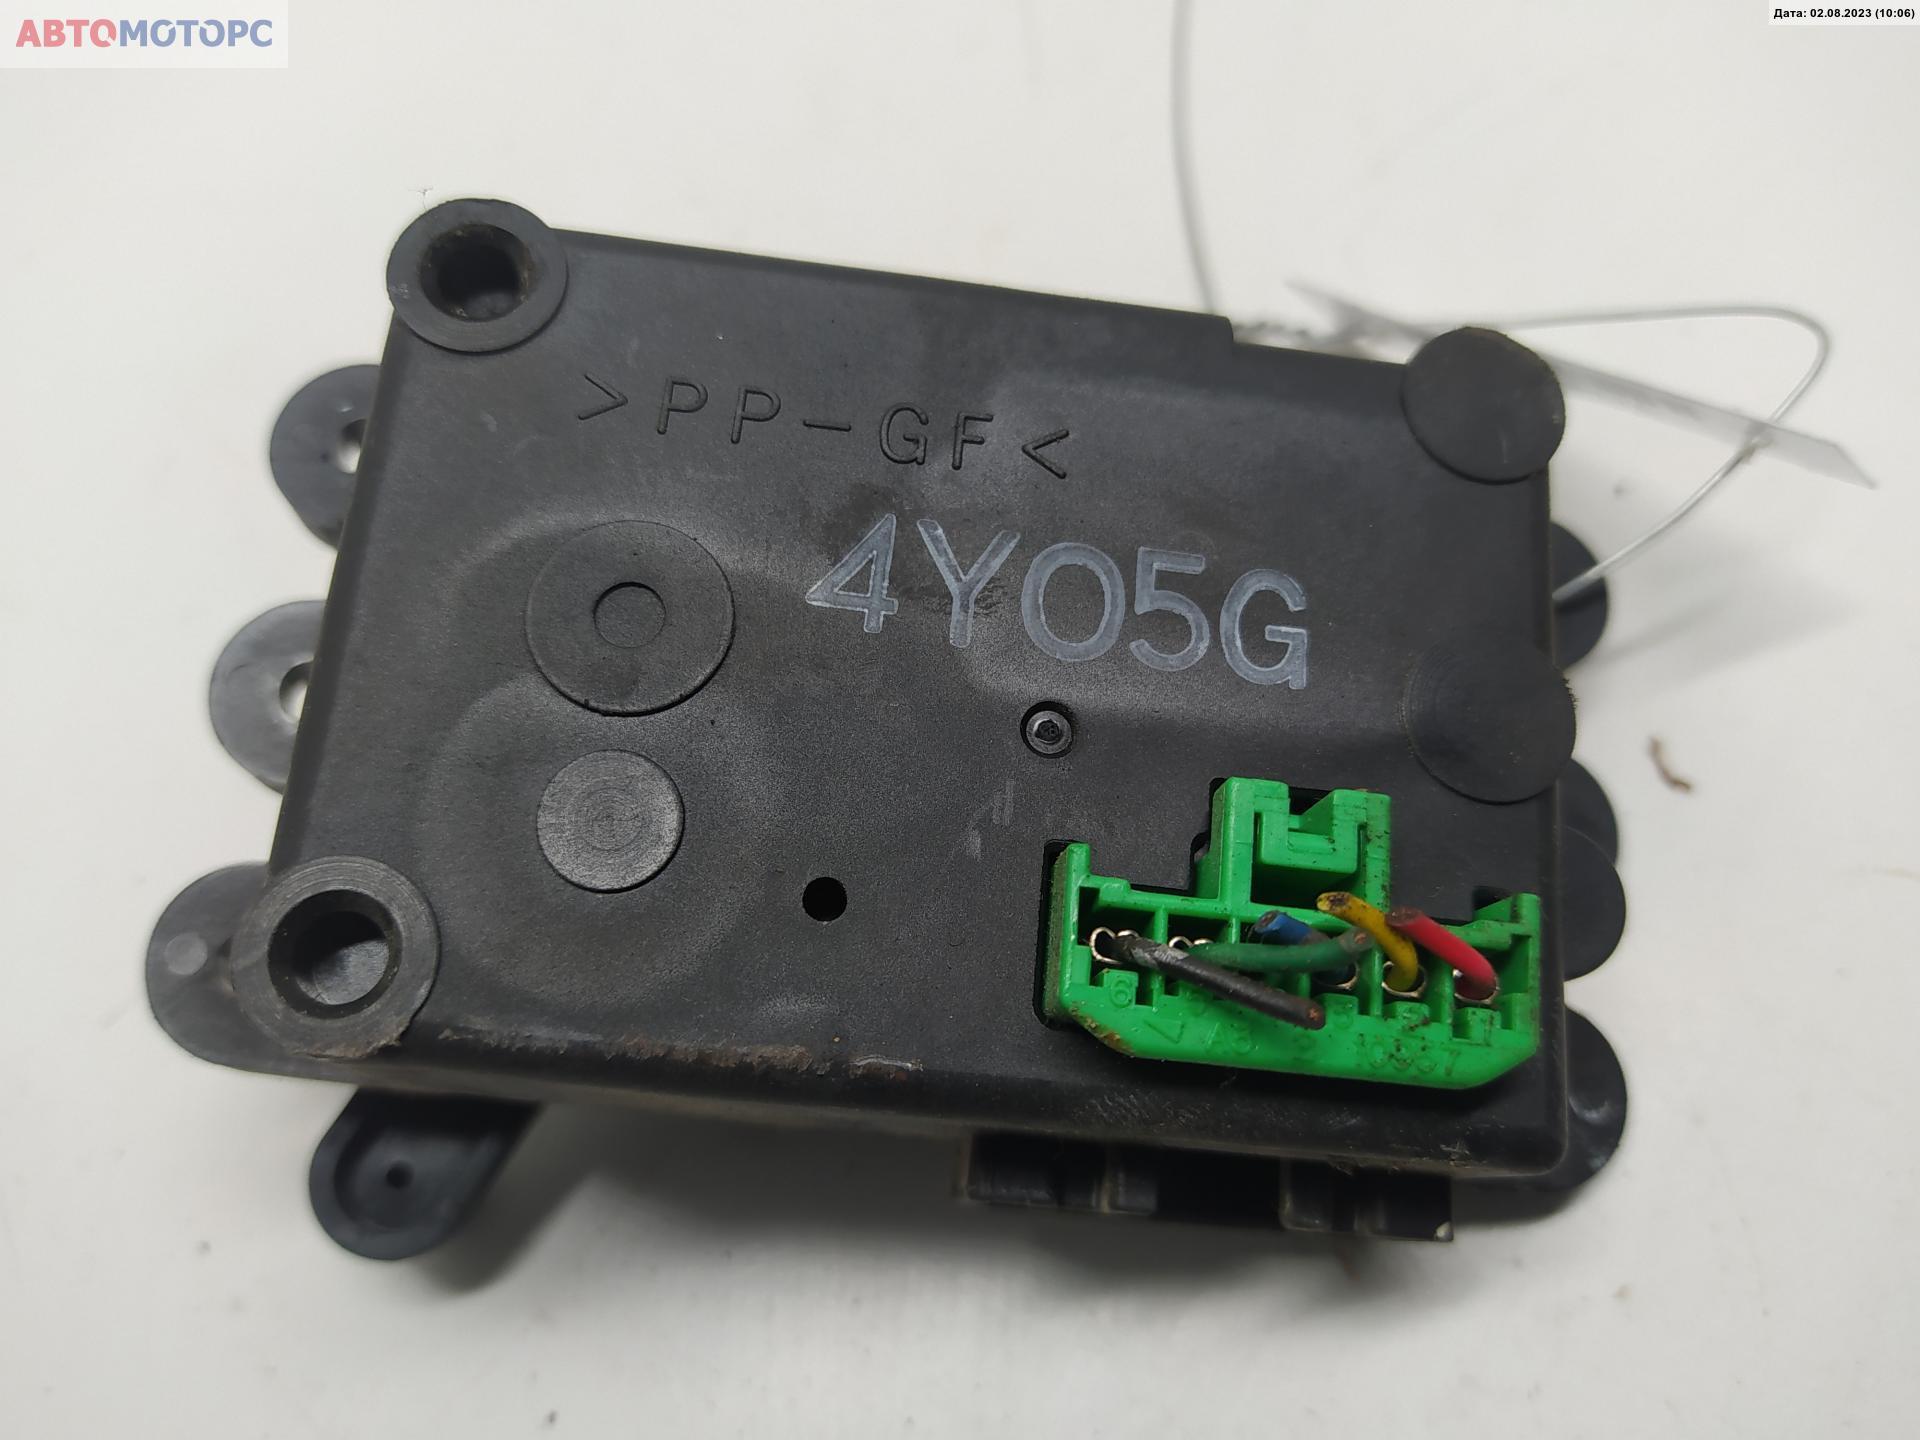 Моторчик заслонки печки   GE7F61A60, 4Y05G